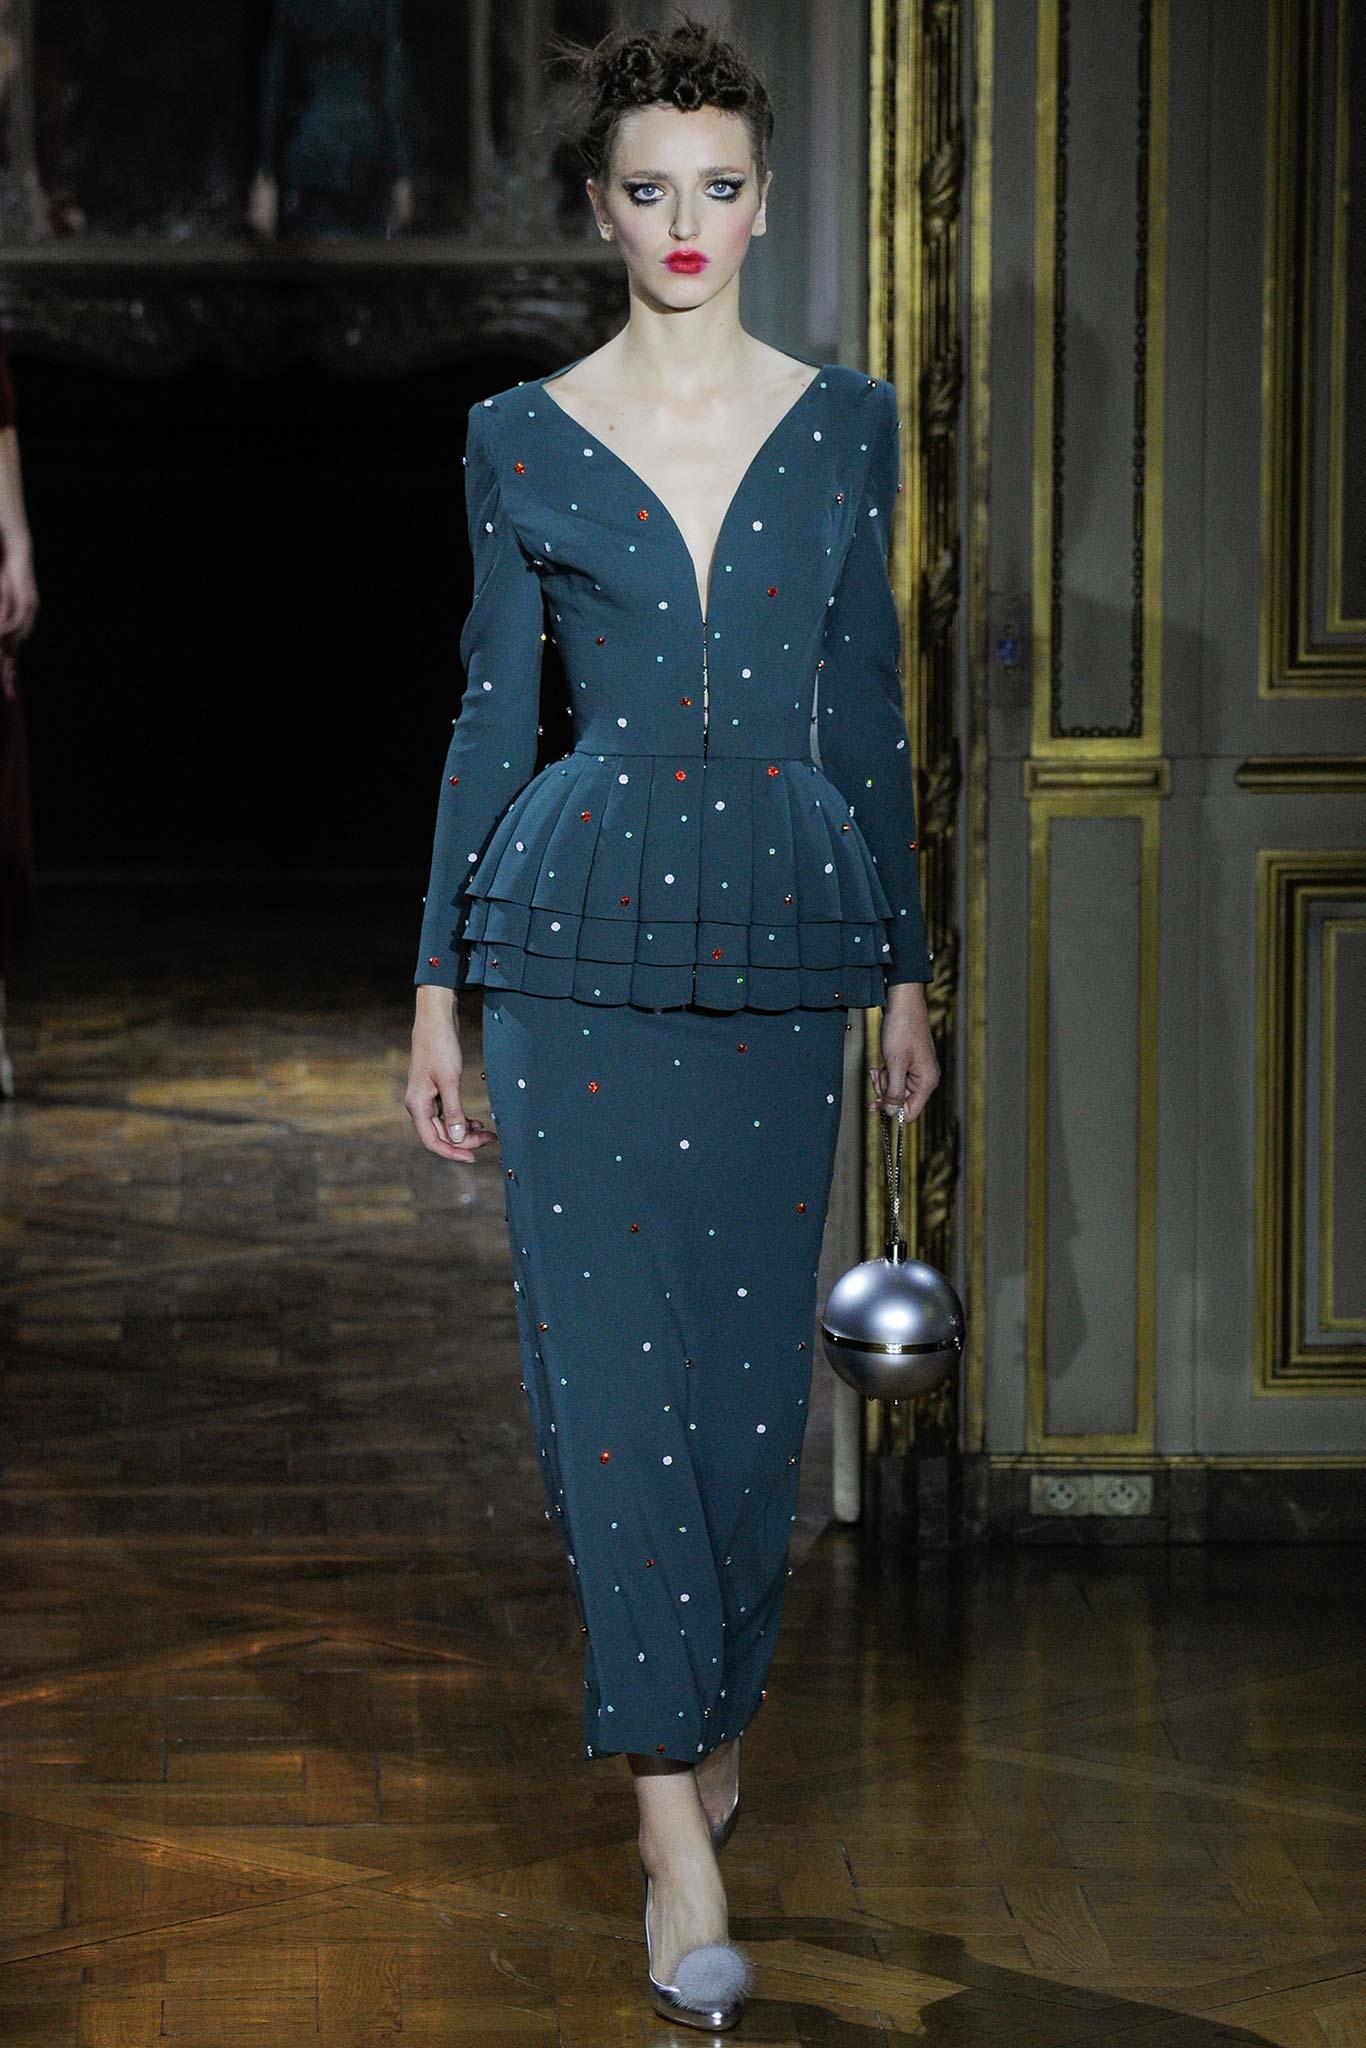 ROSE & IVY Journal Ulyana Sergeenko Fall 2015 Couture